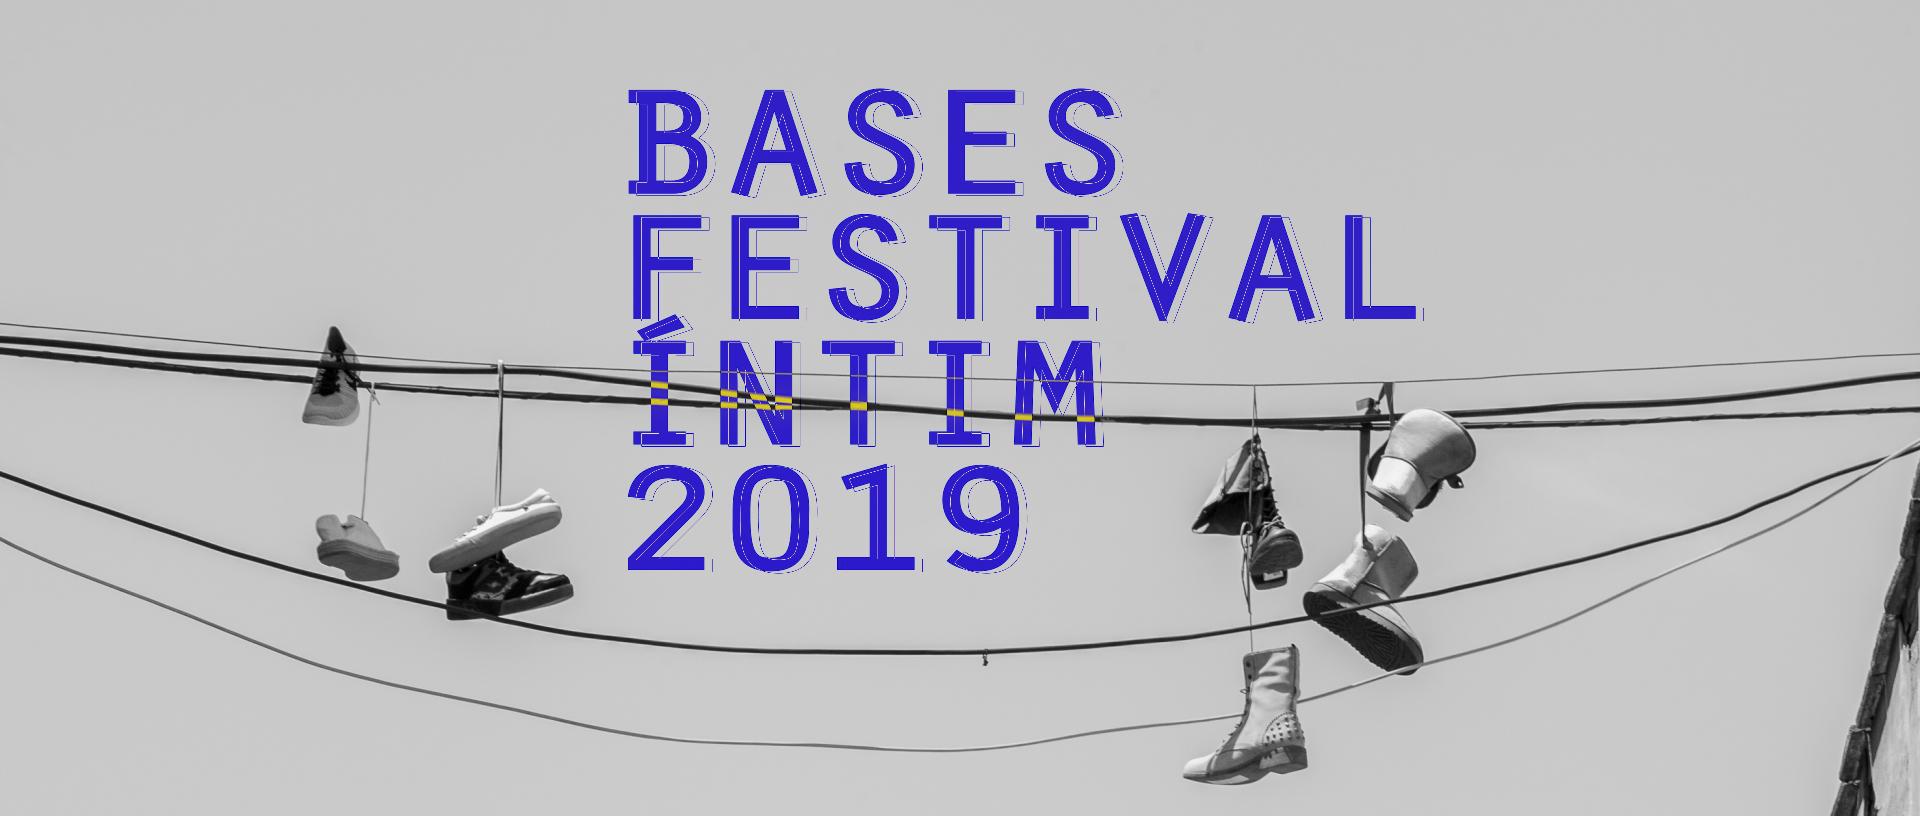 01_BASES_FESTIVAL_ÍNTIM_2019_00000